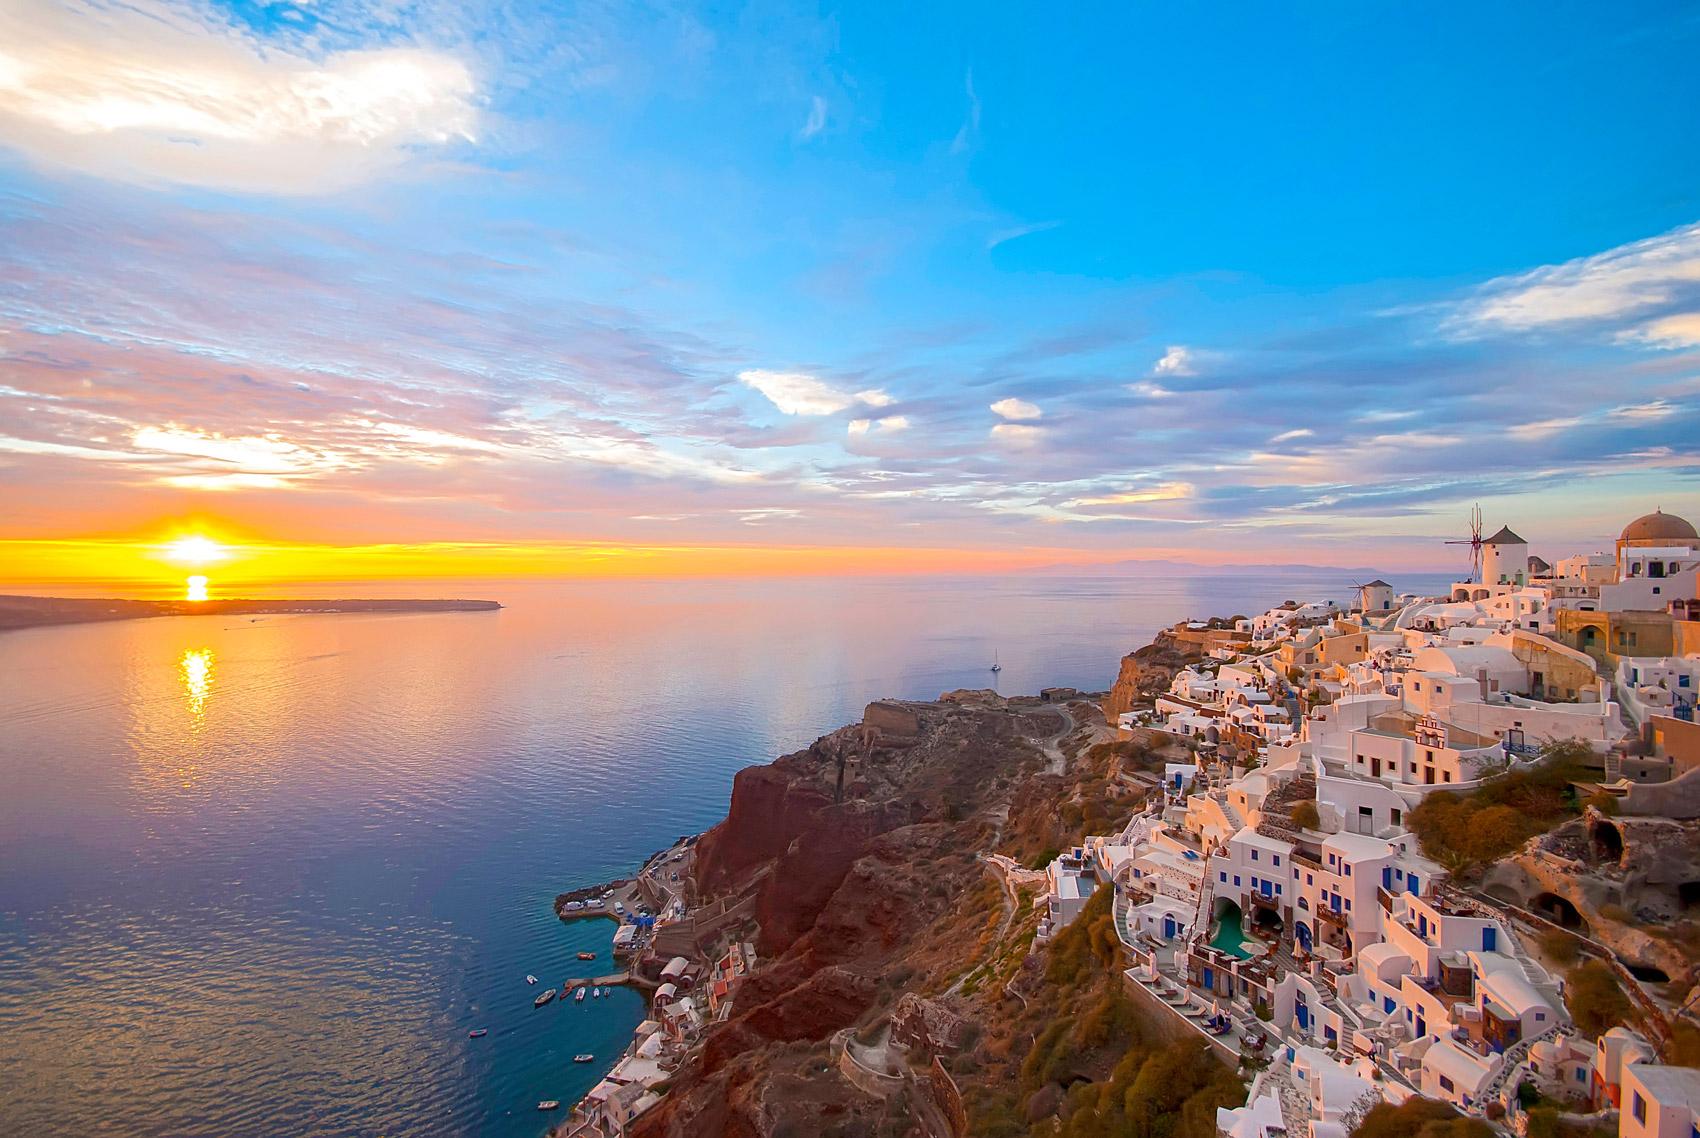 Things to do in Greece, Things to do in Greece